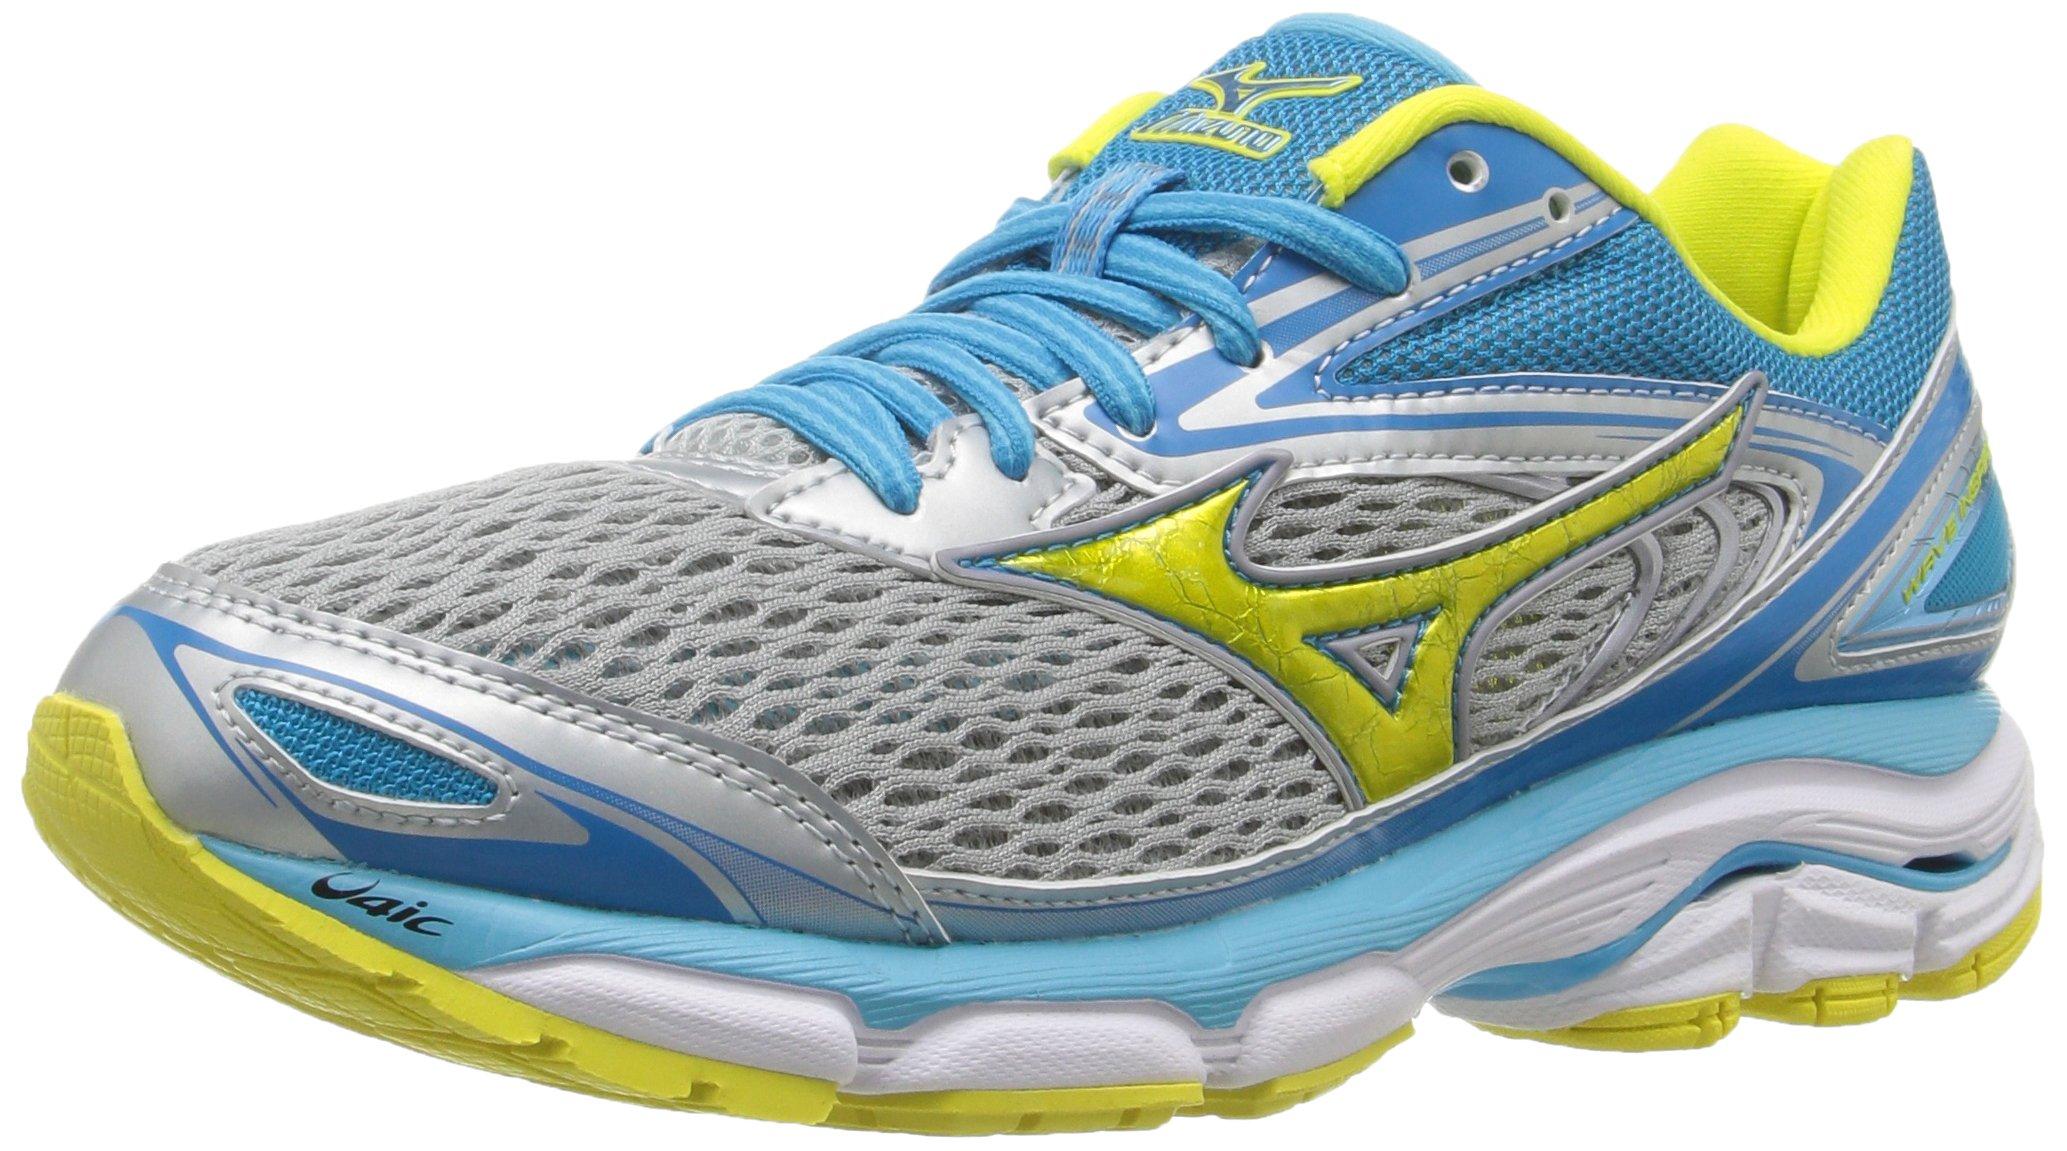 Mizuno Women's Wave Inspire 13 Running Shoe, Grey/Yellow, 9.5 D US